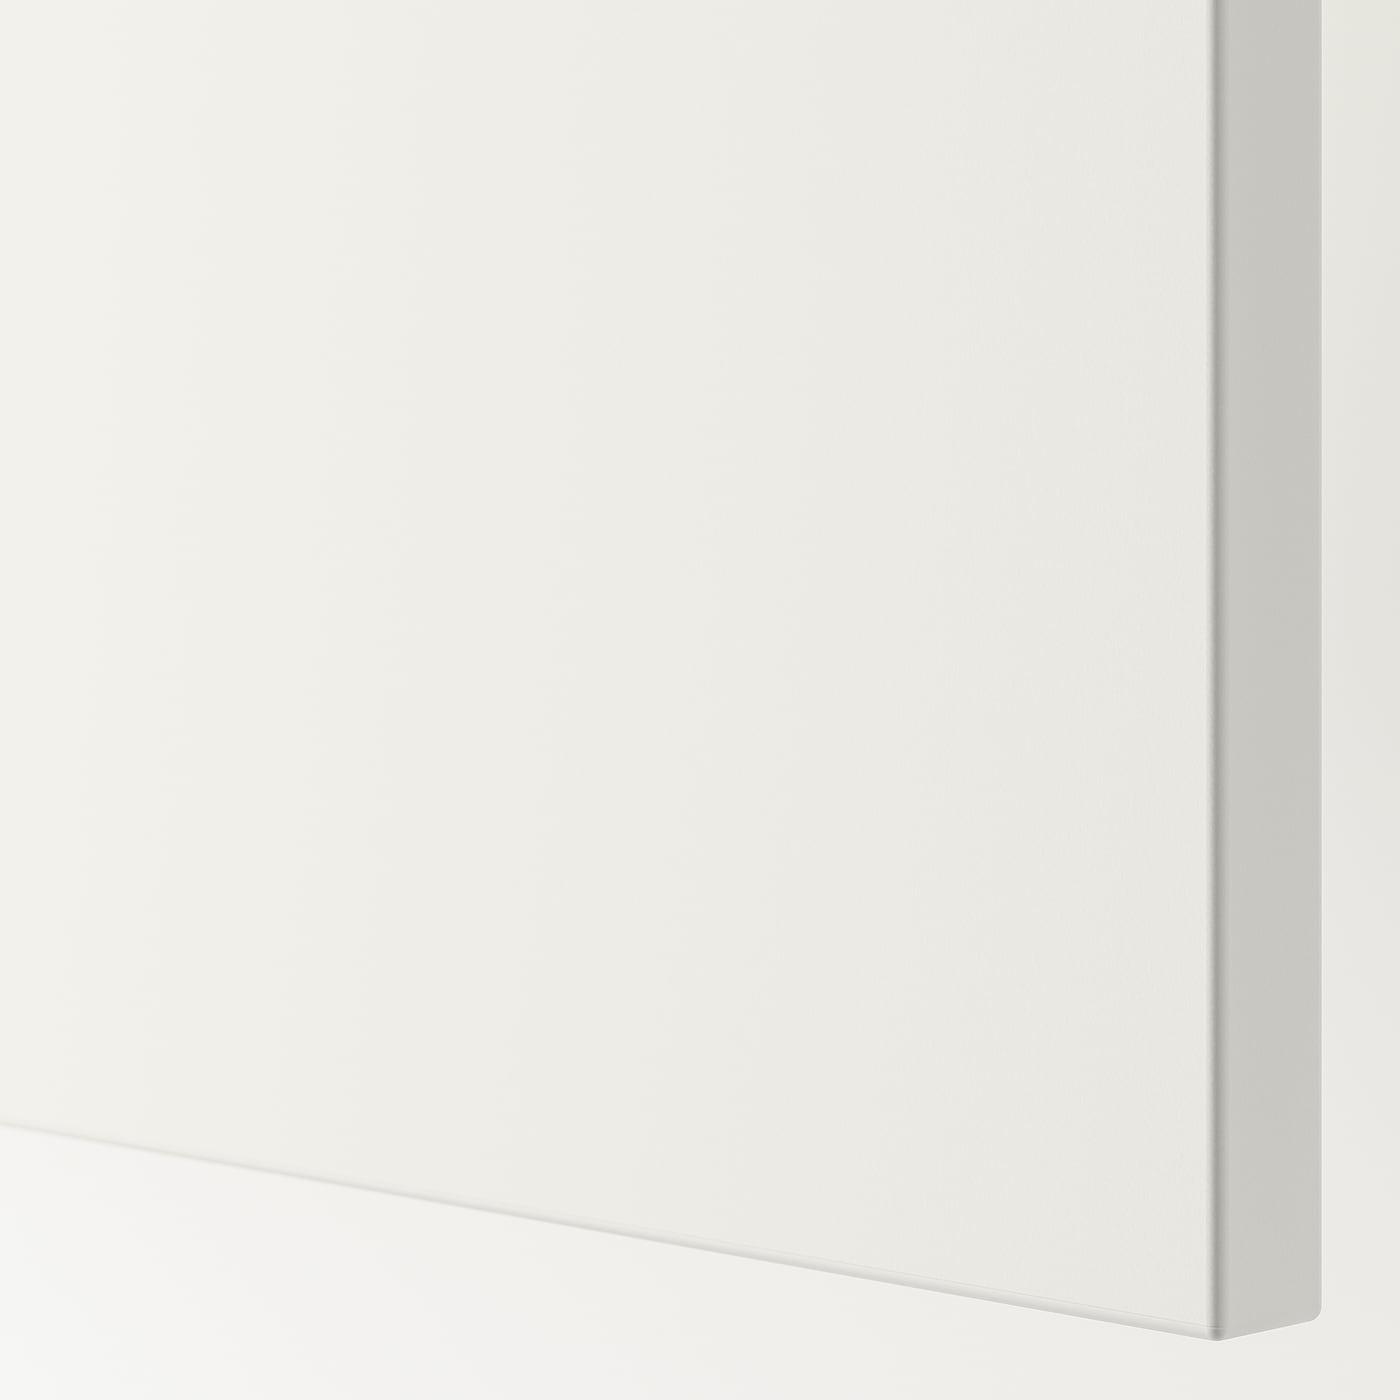 FONNES door white 60 cm 40 cm 1.6 cm